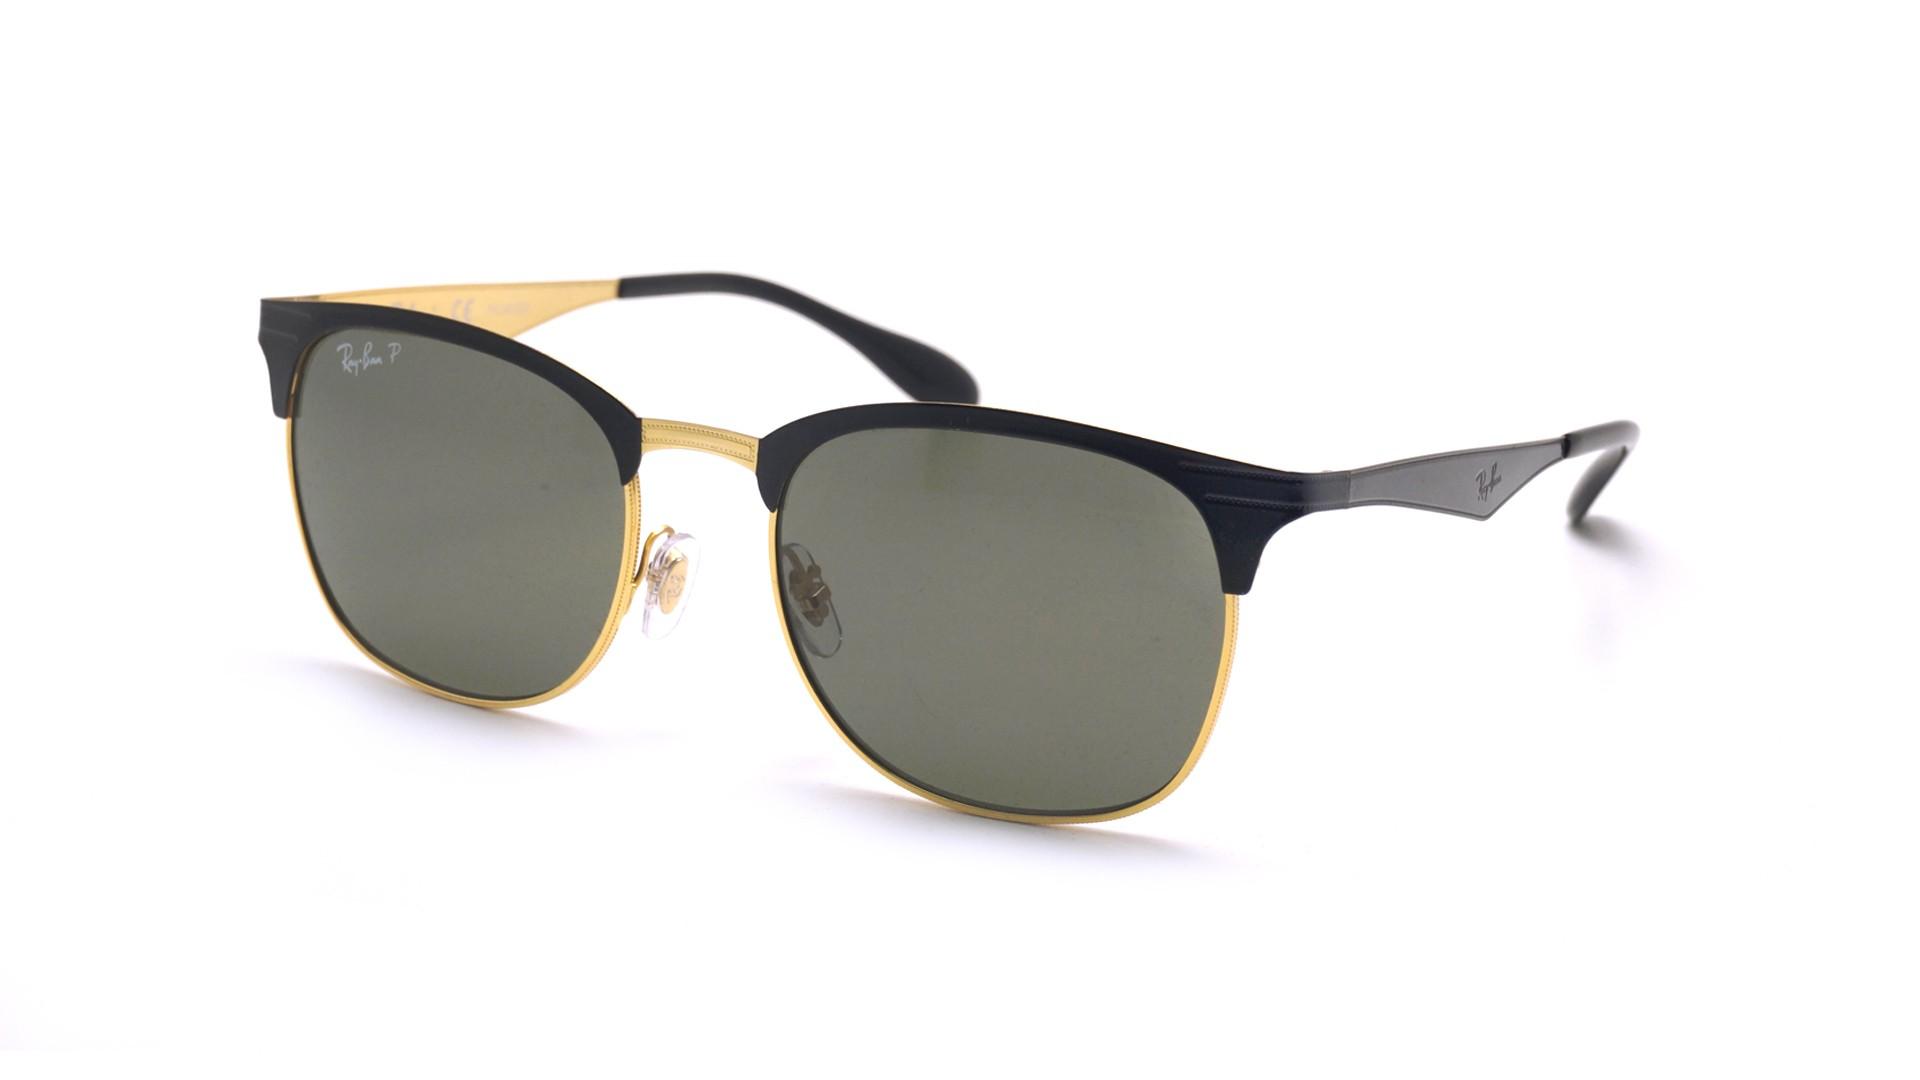 2eba7cf49 Sunglasses Ray-Ban RB3538 187/9A 53-19 Black Medium Polarized